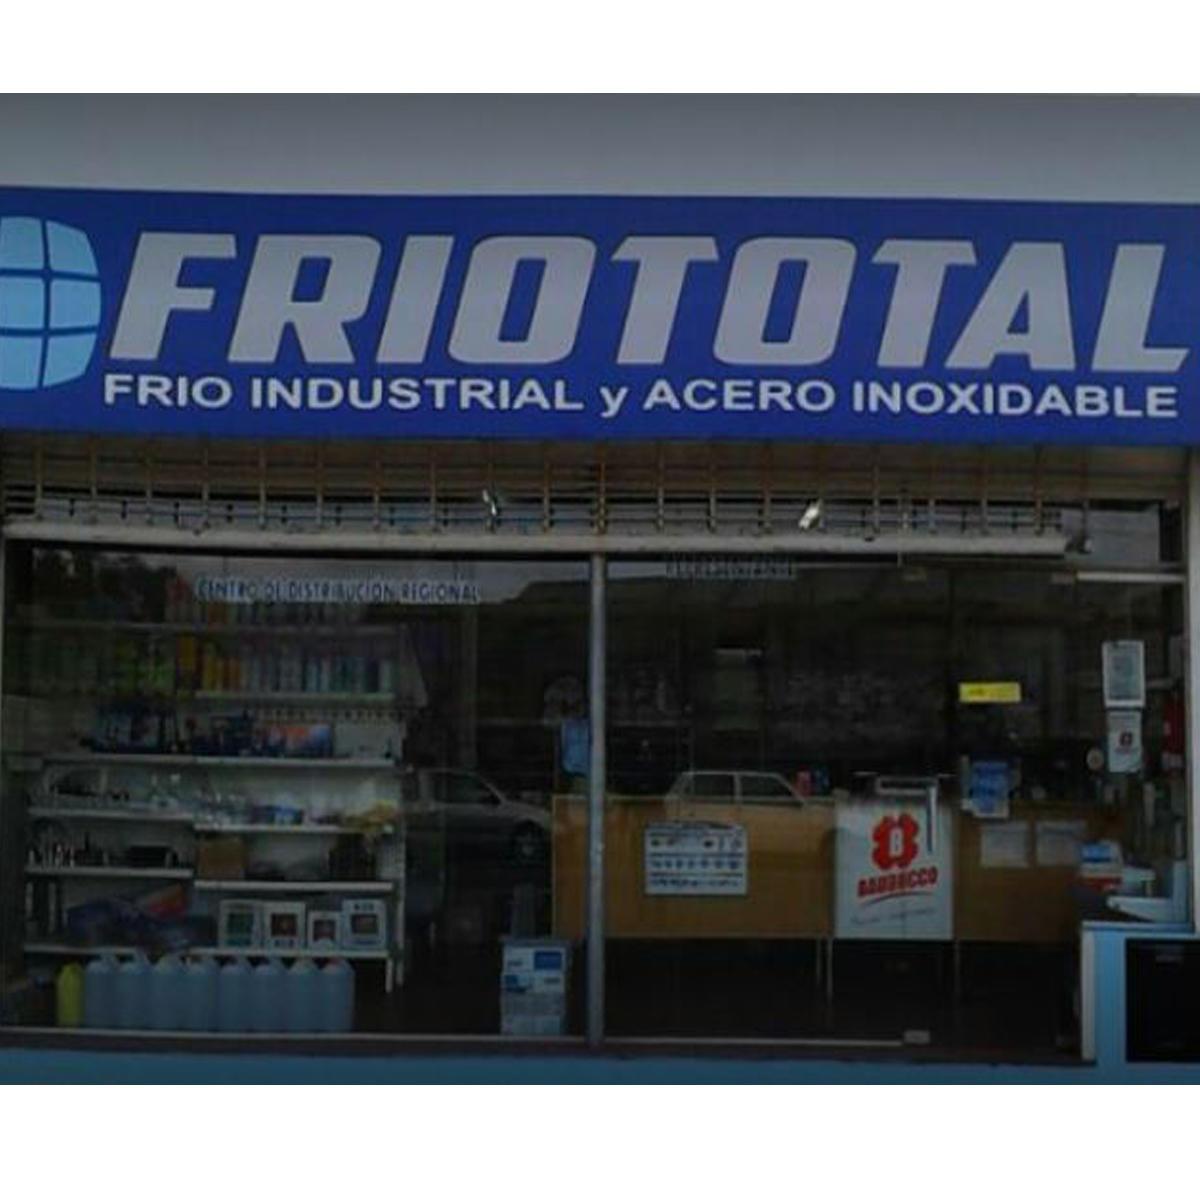 FRIOTOTAL